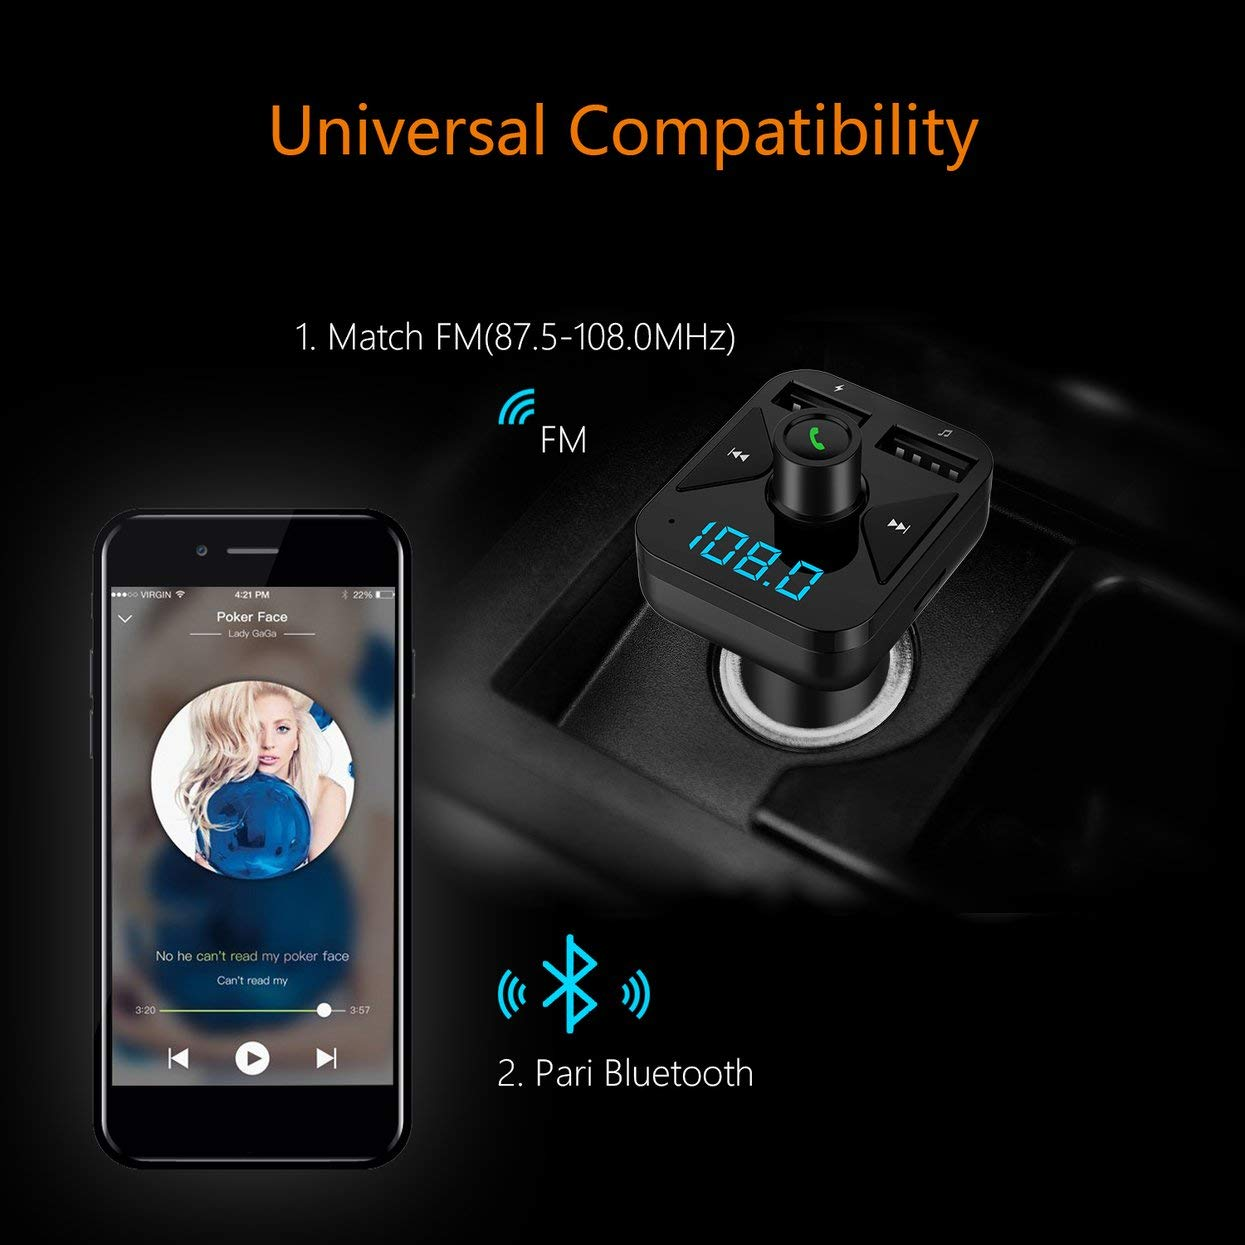 BT16 3.4A USB Charger Car Kit FM Transmitter Modulator Audio Music Car Mp3 Player Phone Wireless Handsfree Carkit Black